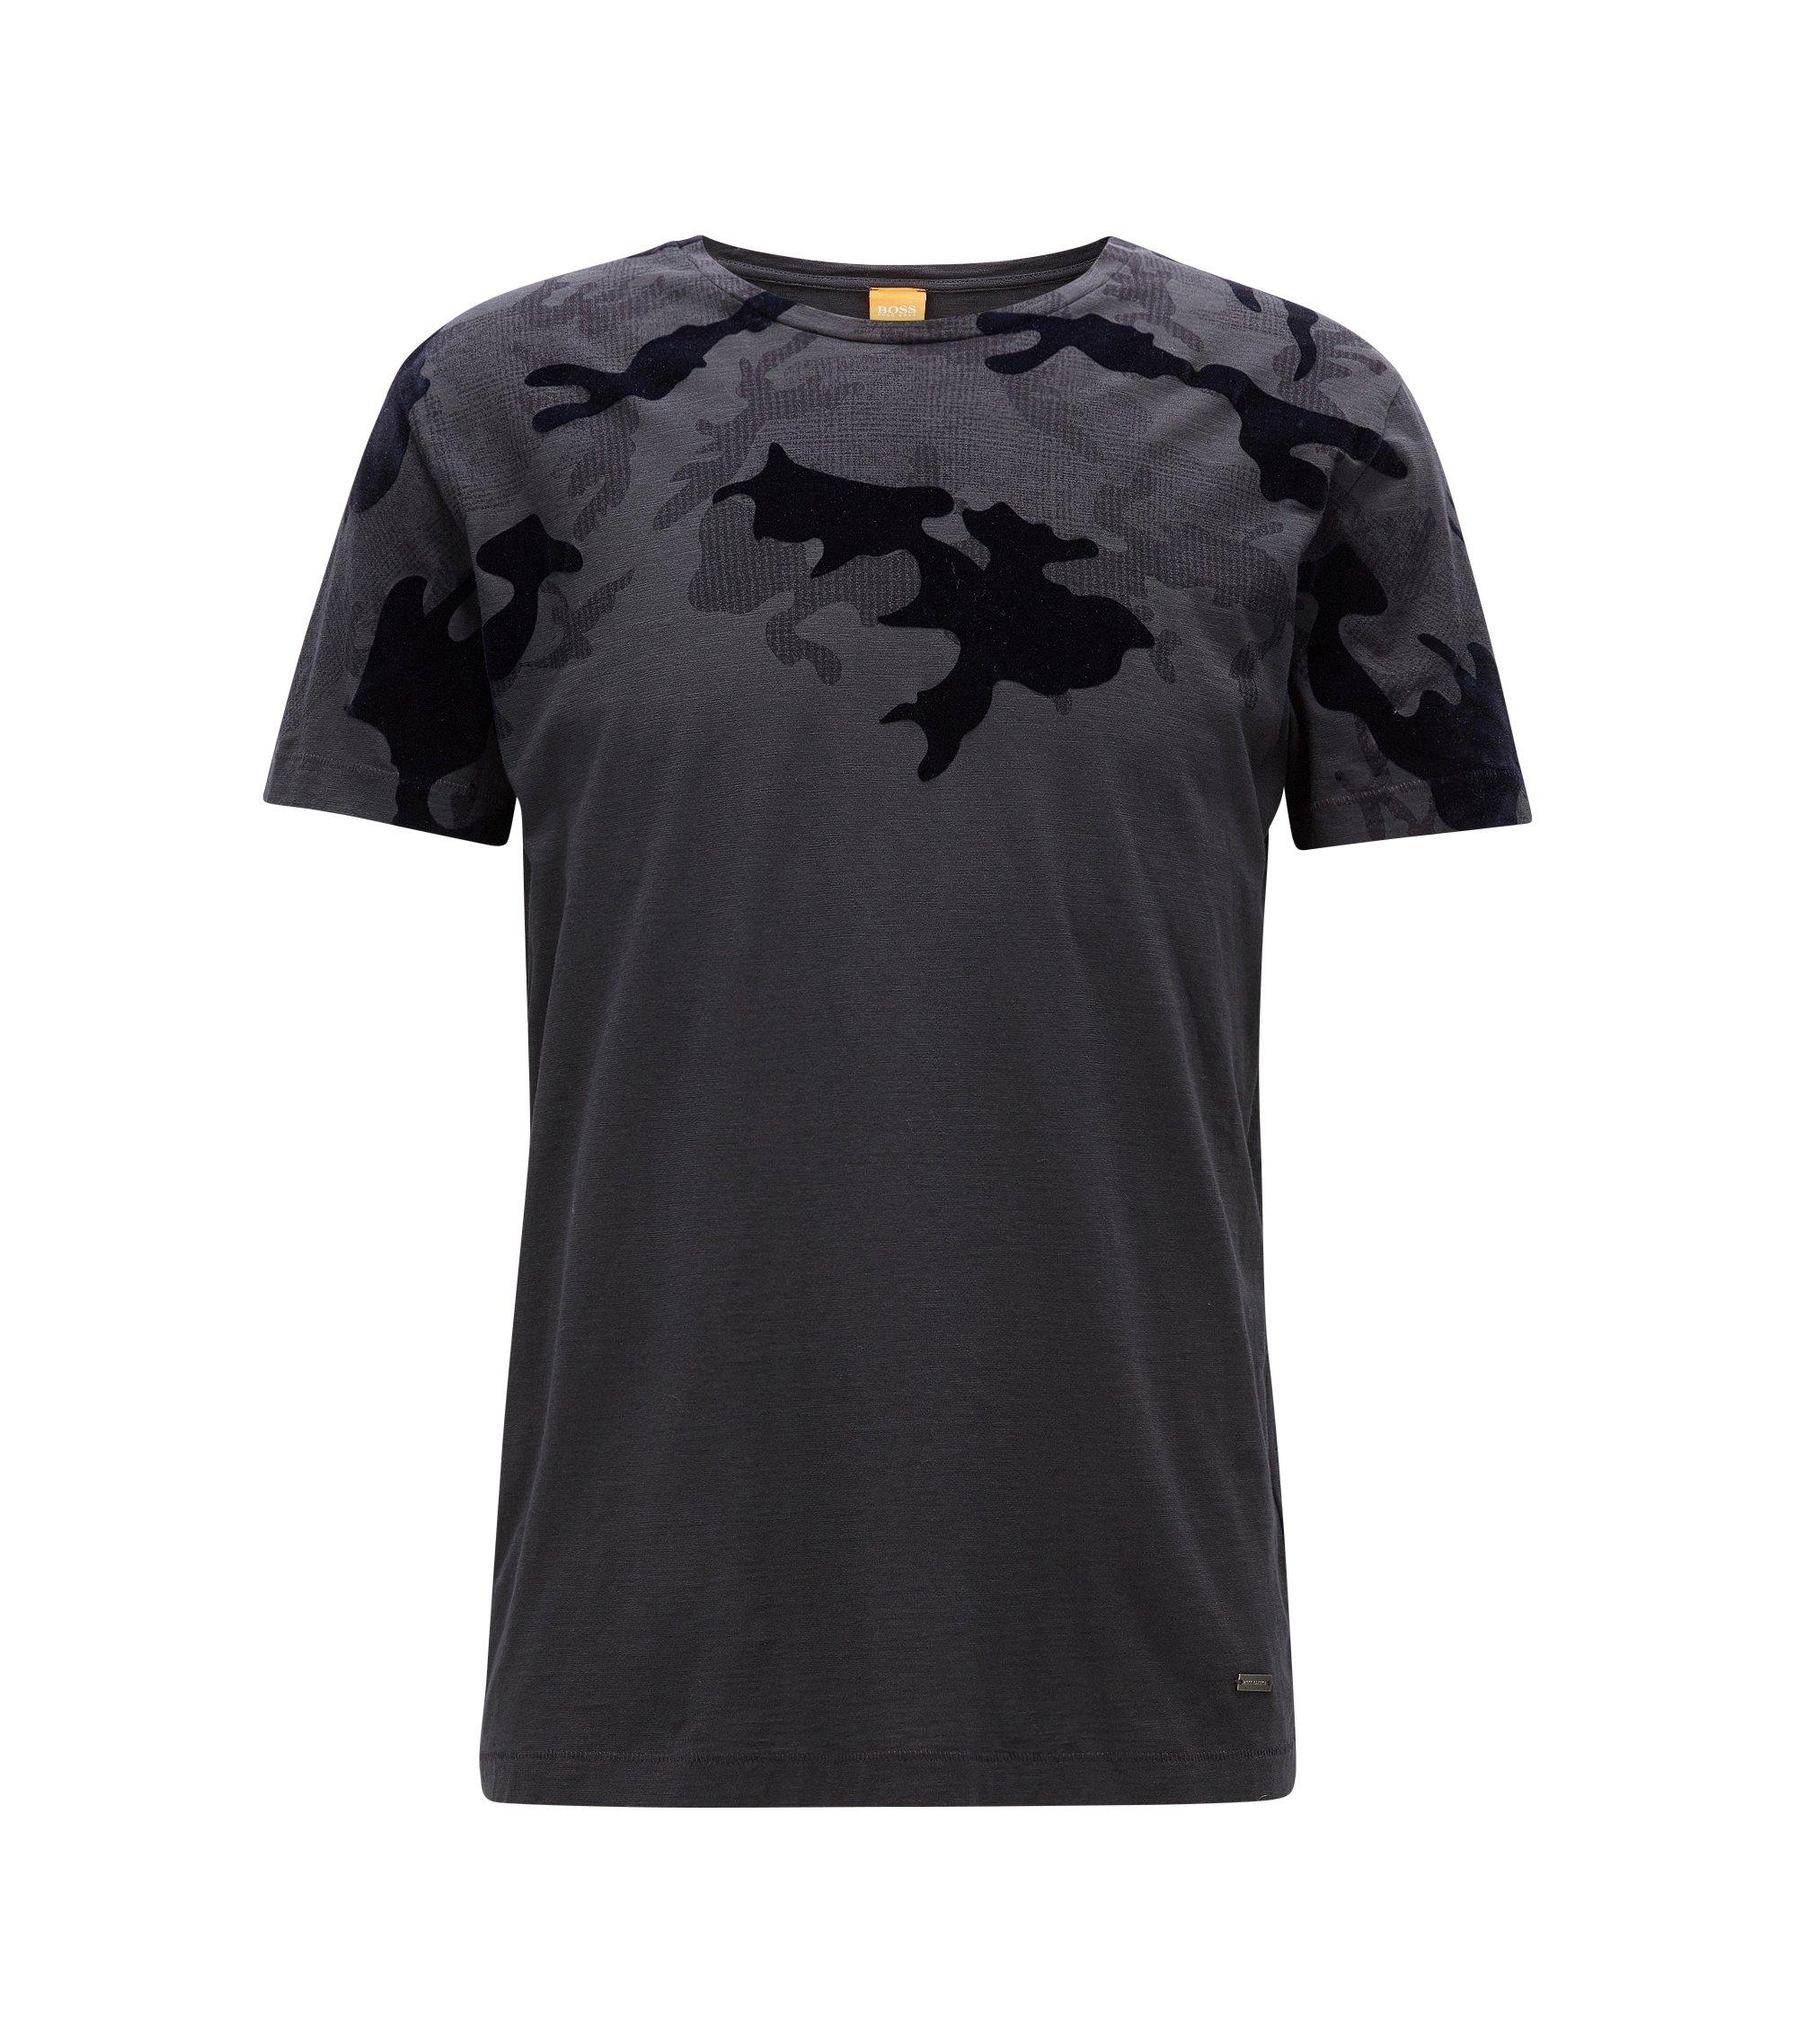 Bedrucktes Regular Fit T-Shirt aus strukturiertem Baumwoll-Jersey, Schwarz